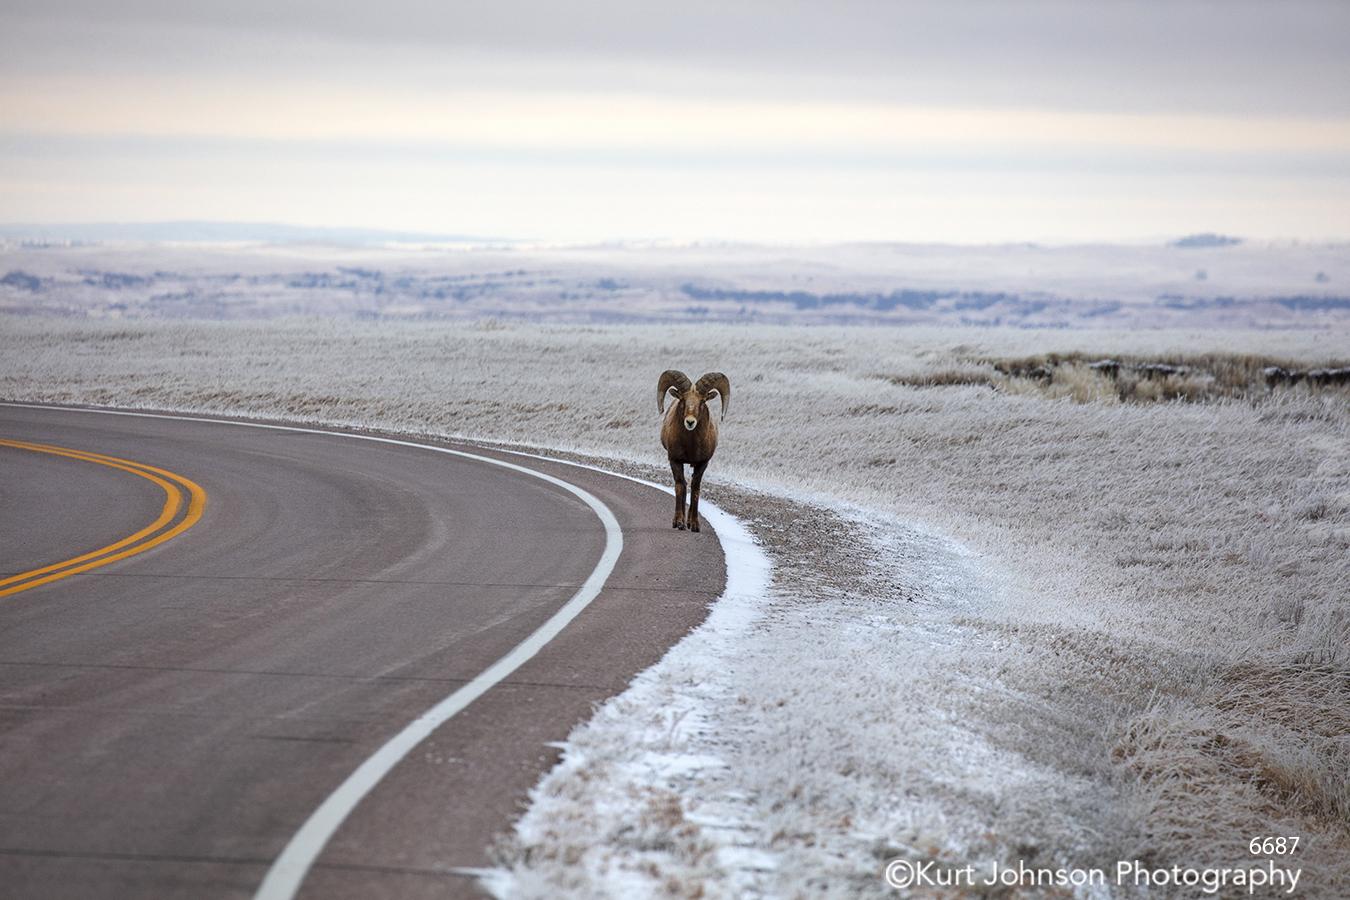 Badlands Dakotas South Dakota mountain sheep wildlife mountains road path animal brown gray